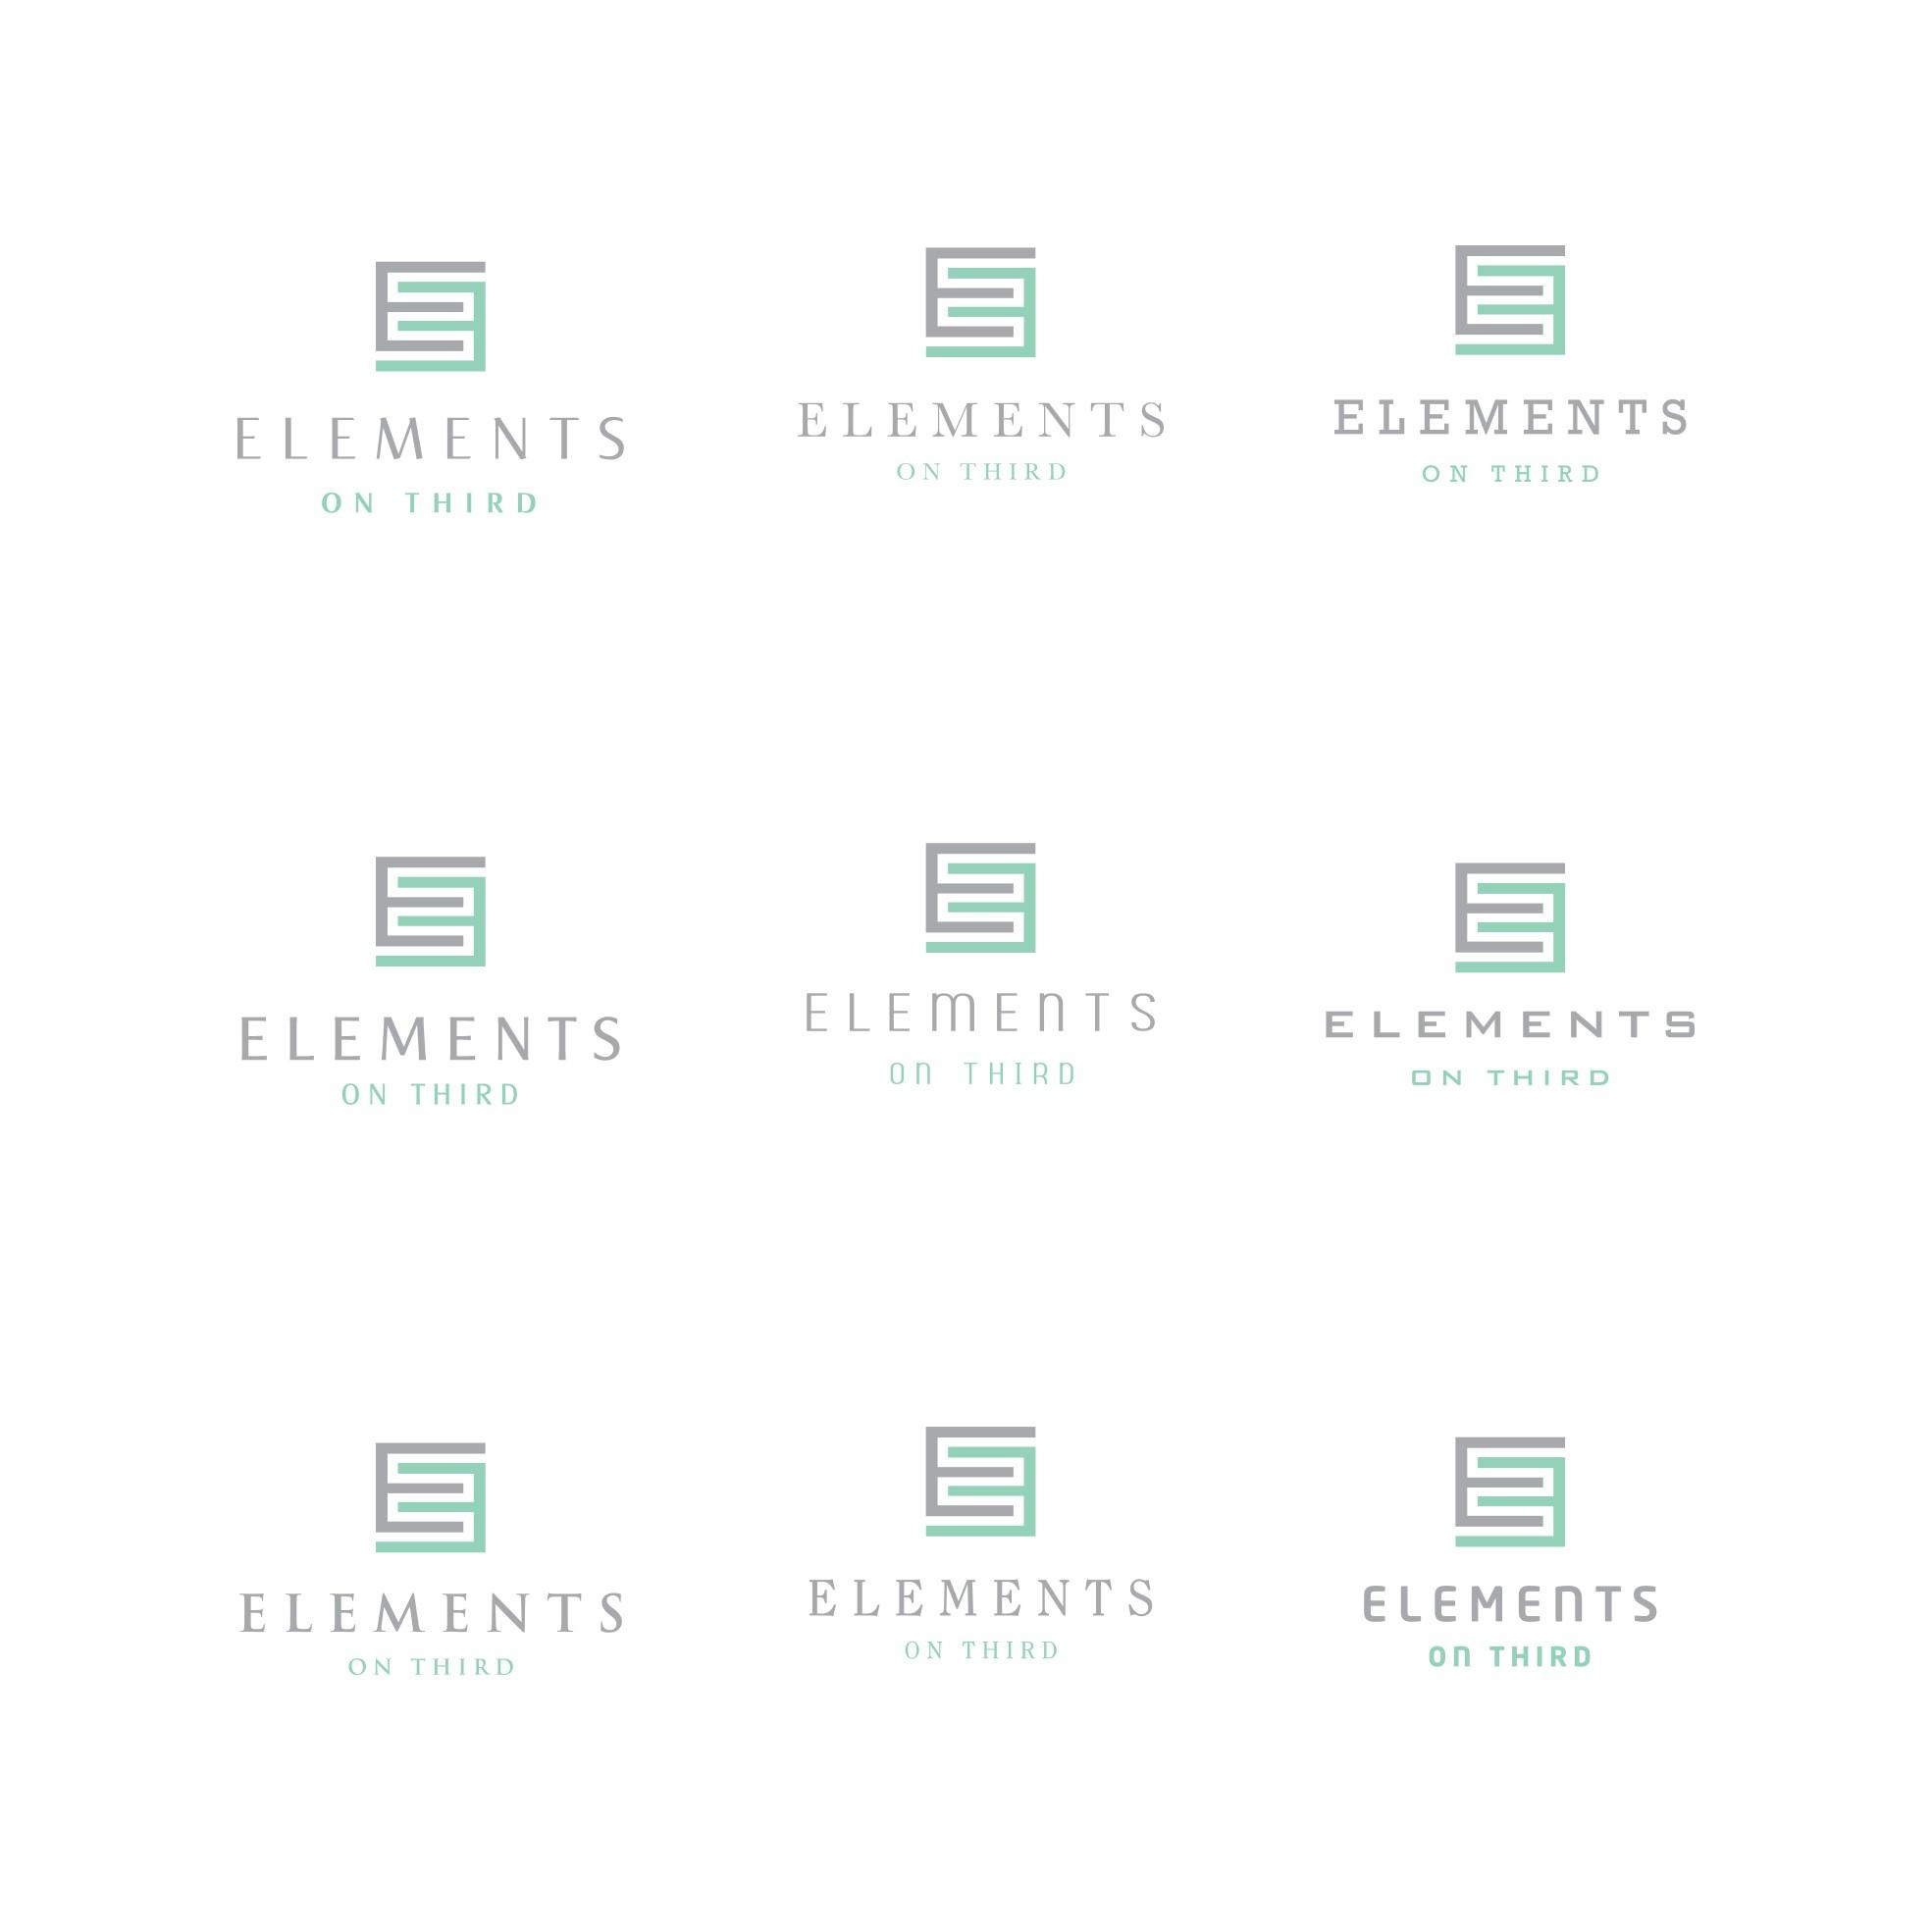 Elements on Third